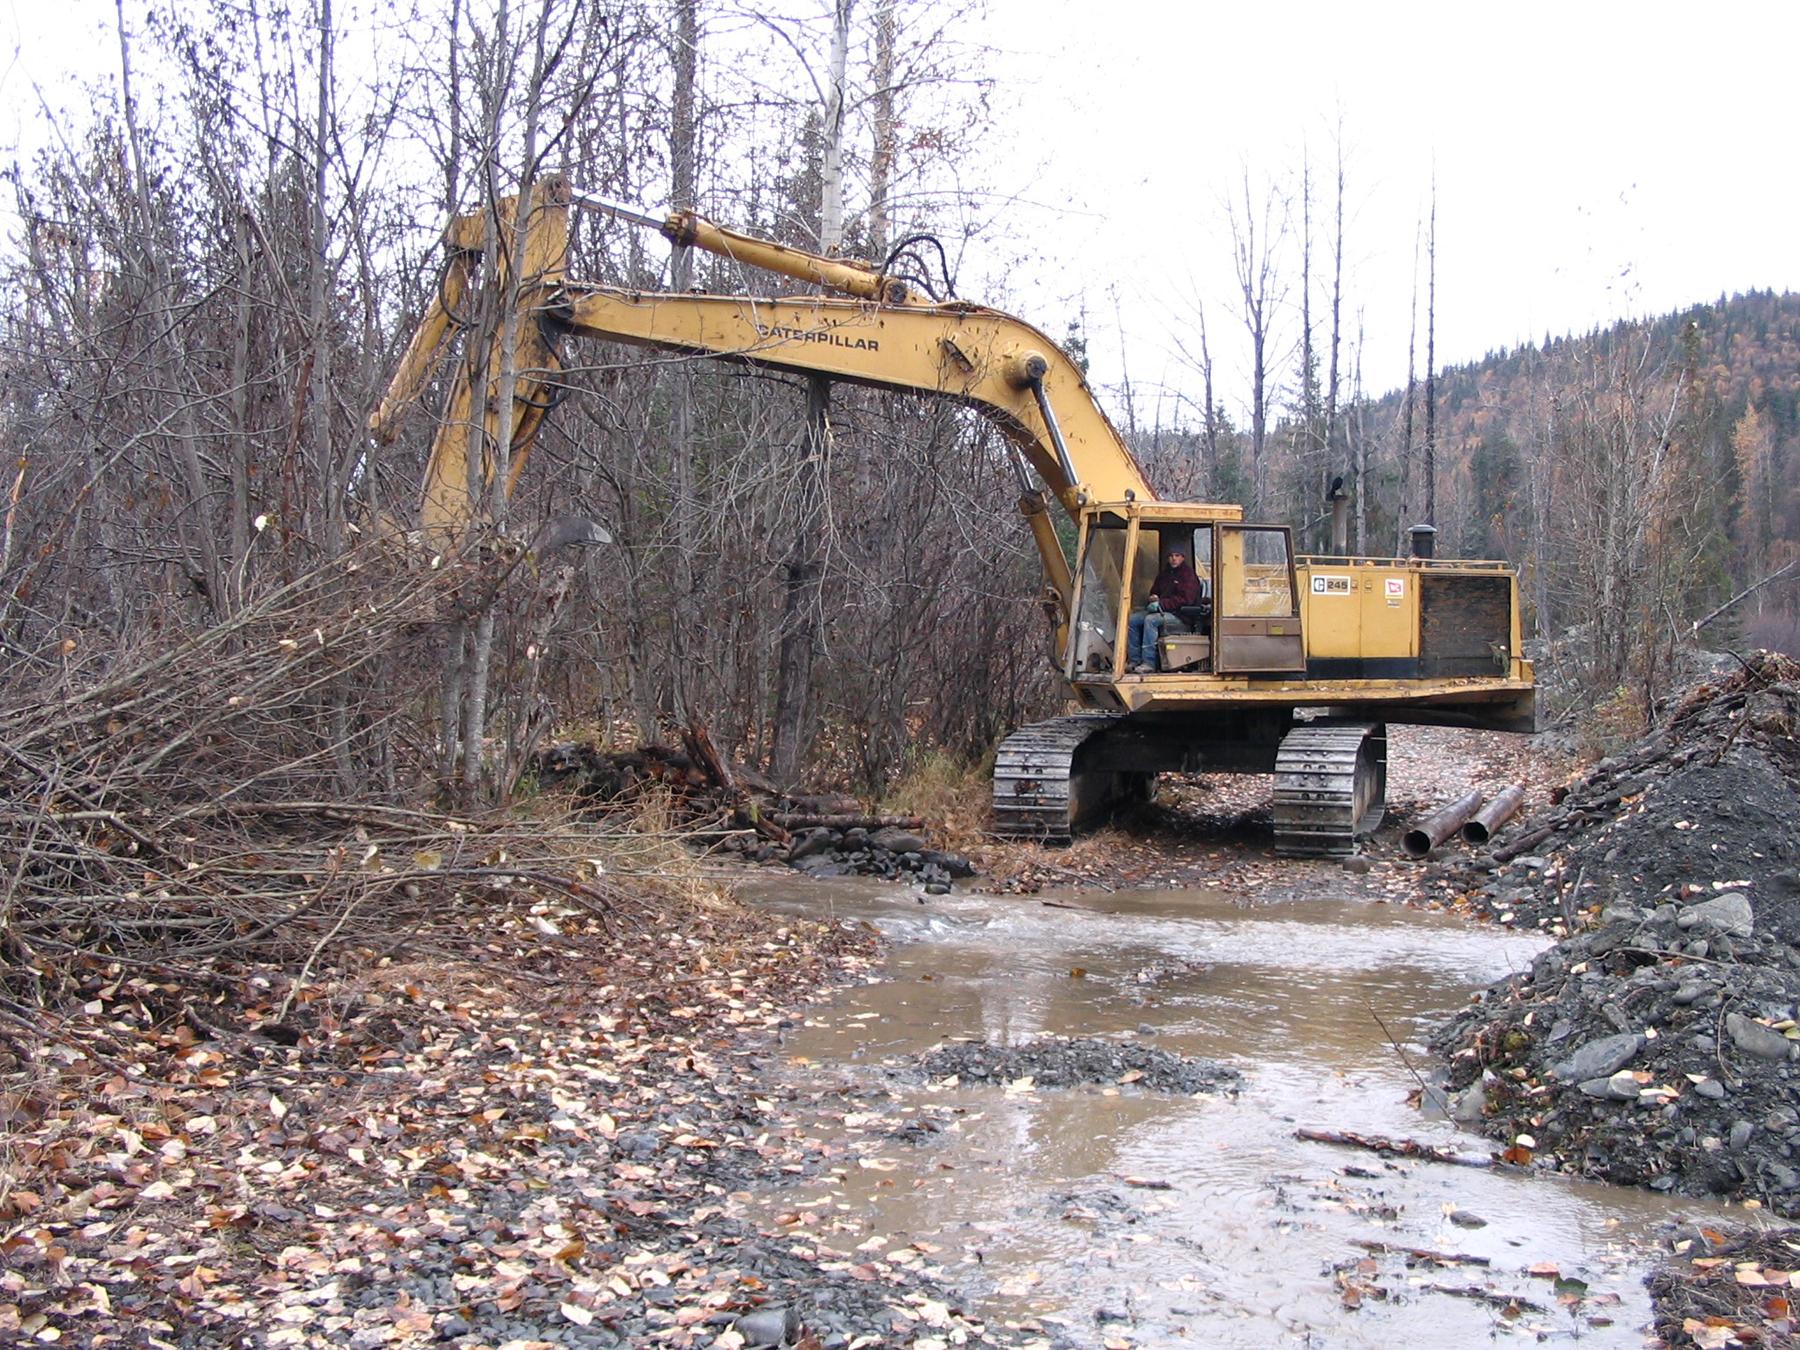 071013 Monte Working Pond by Gate